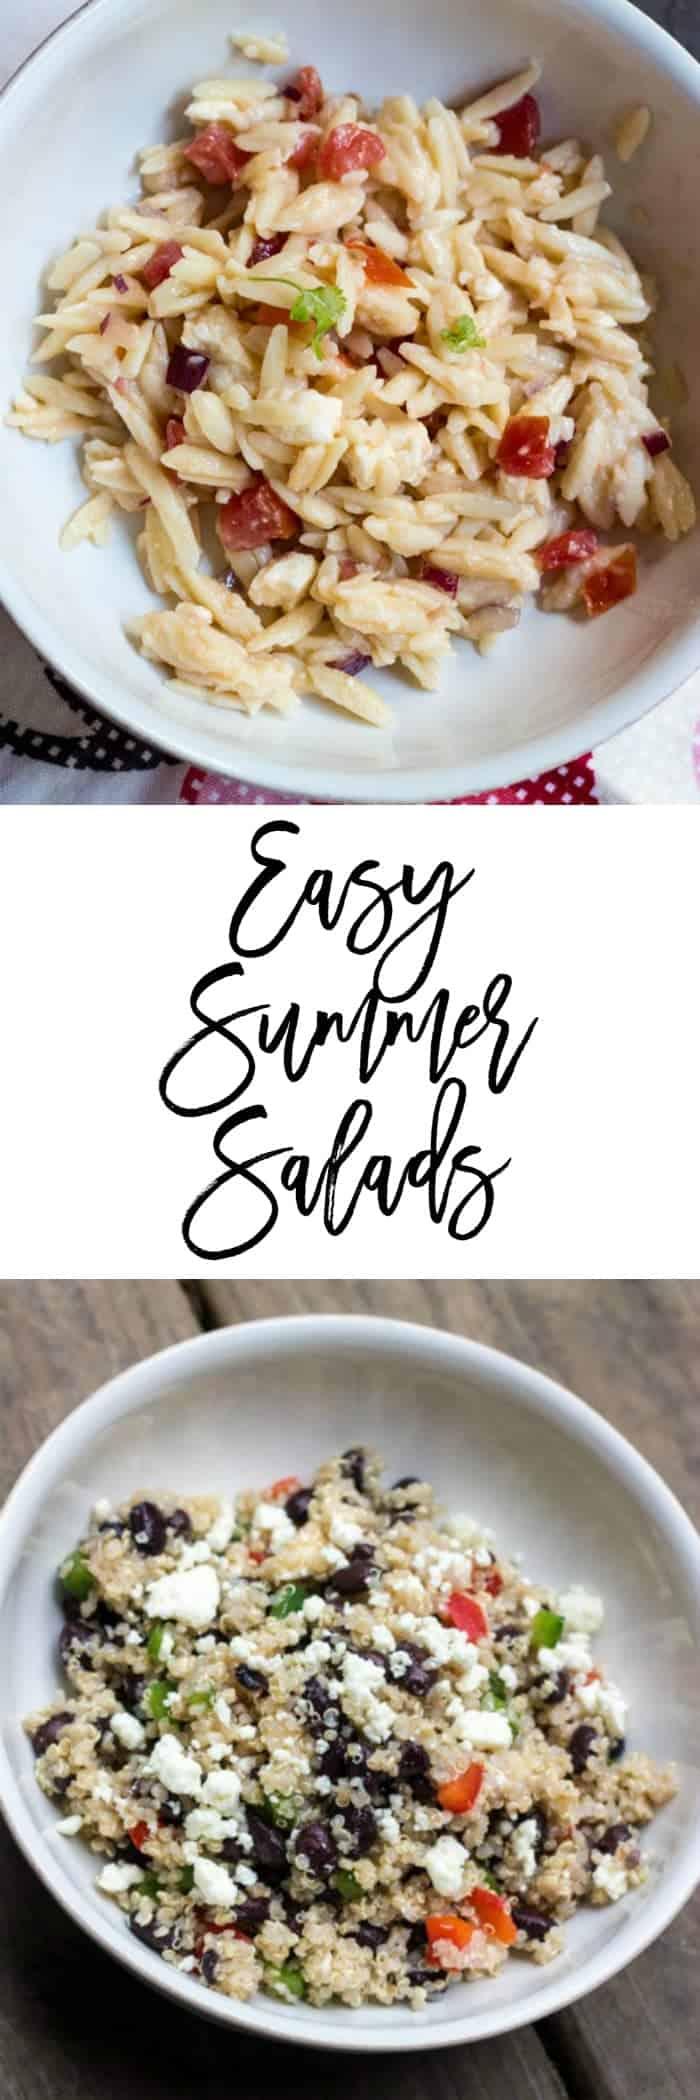 Easy Summer Salads